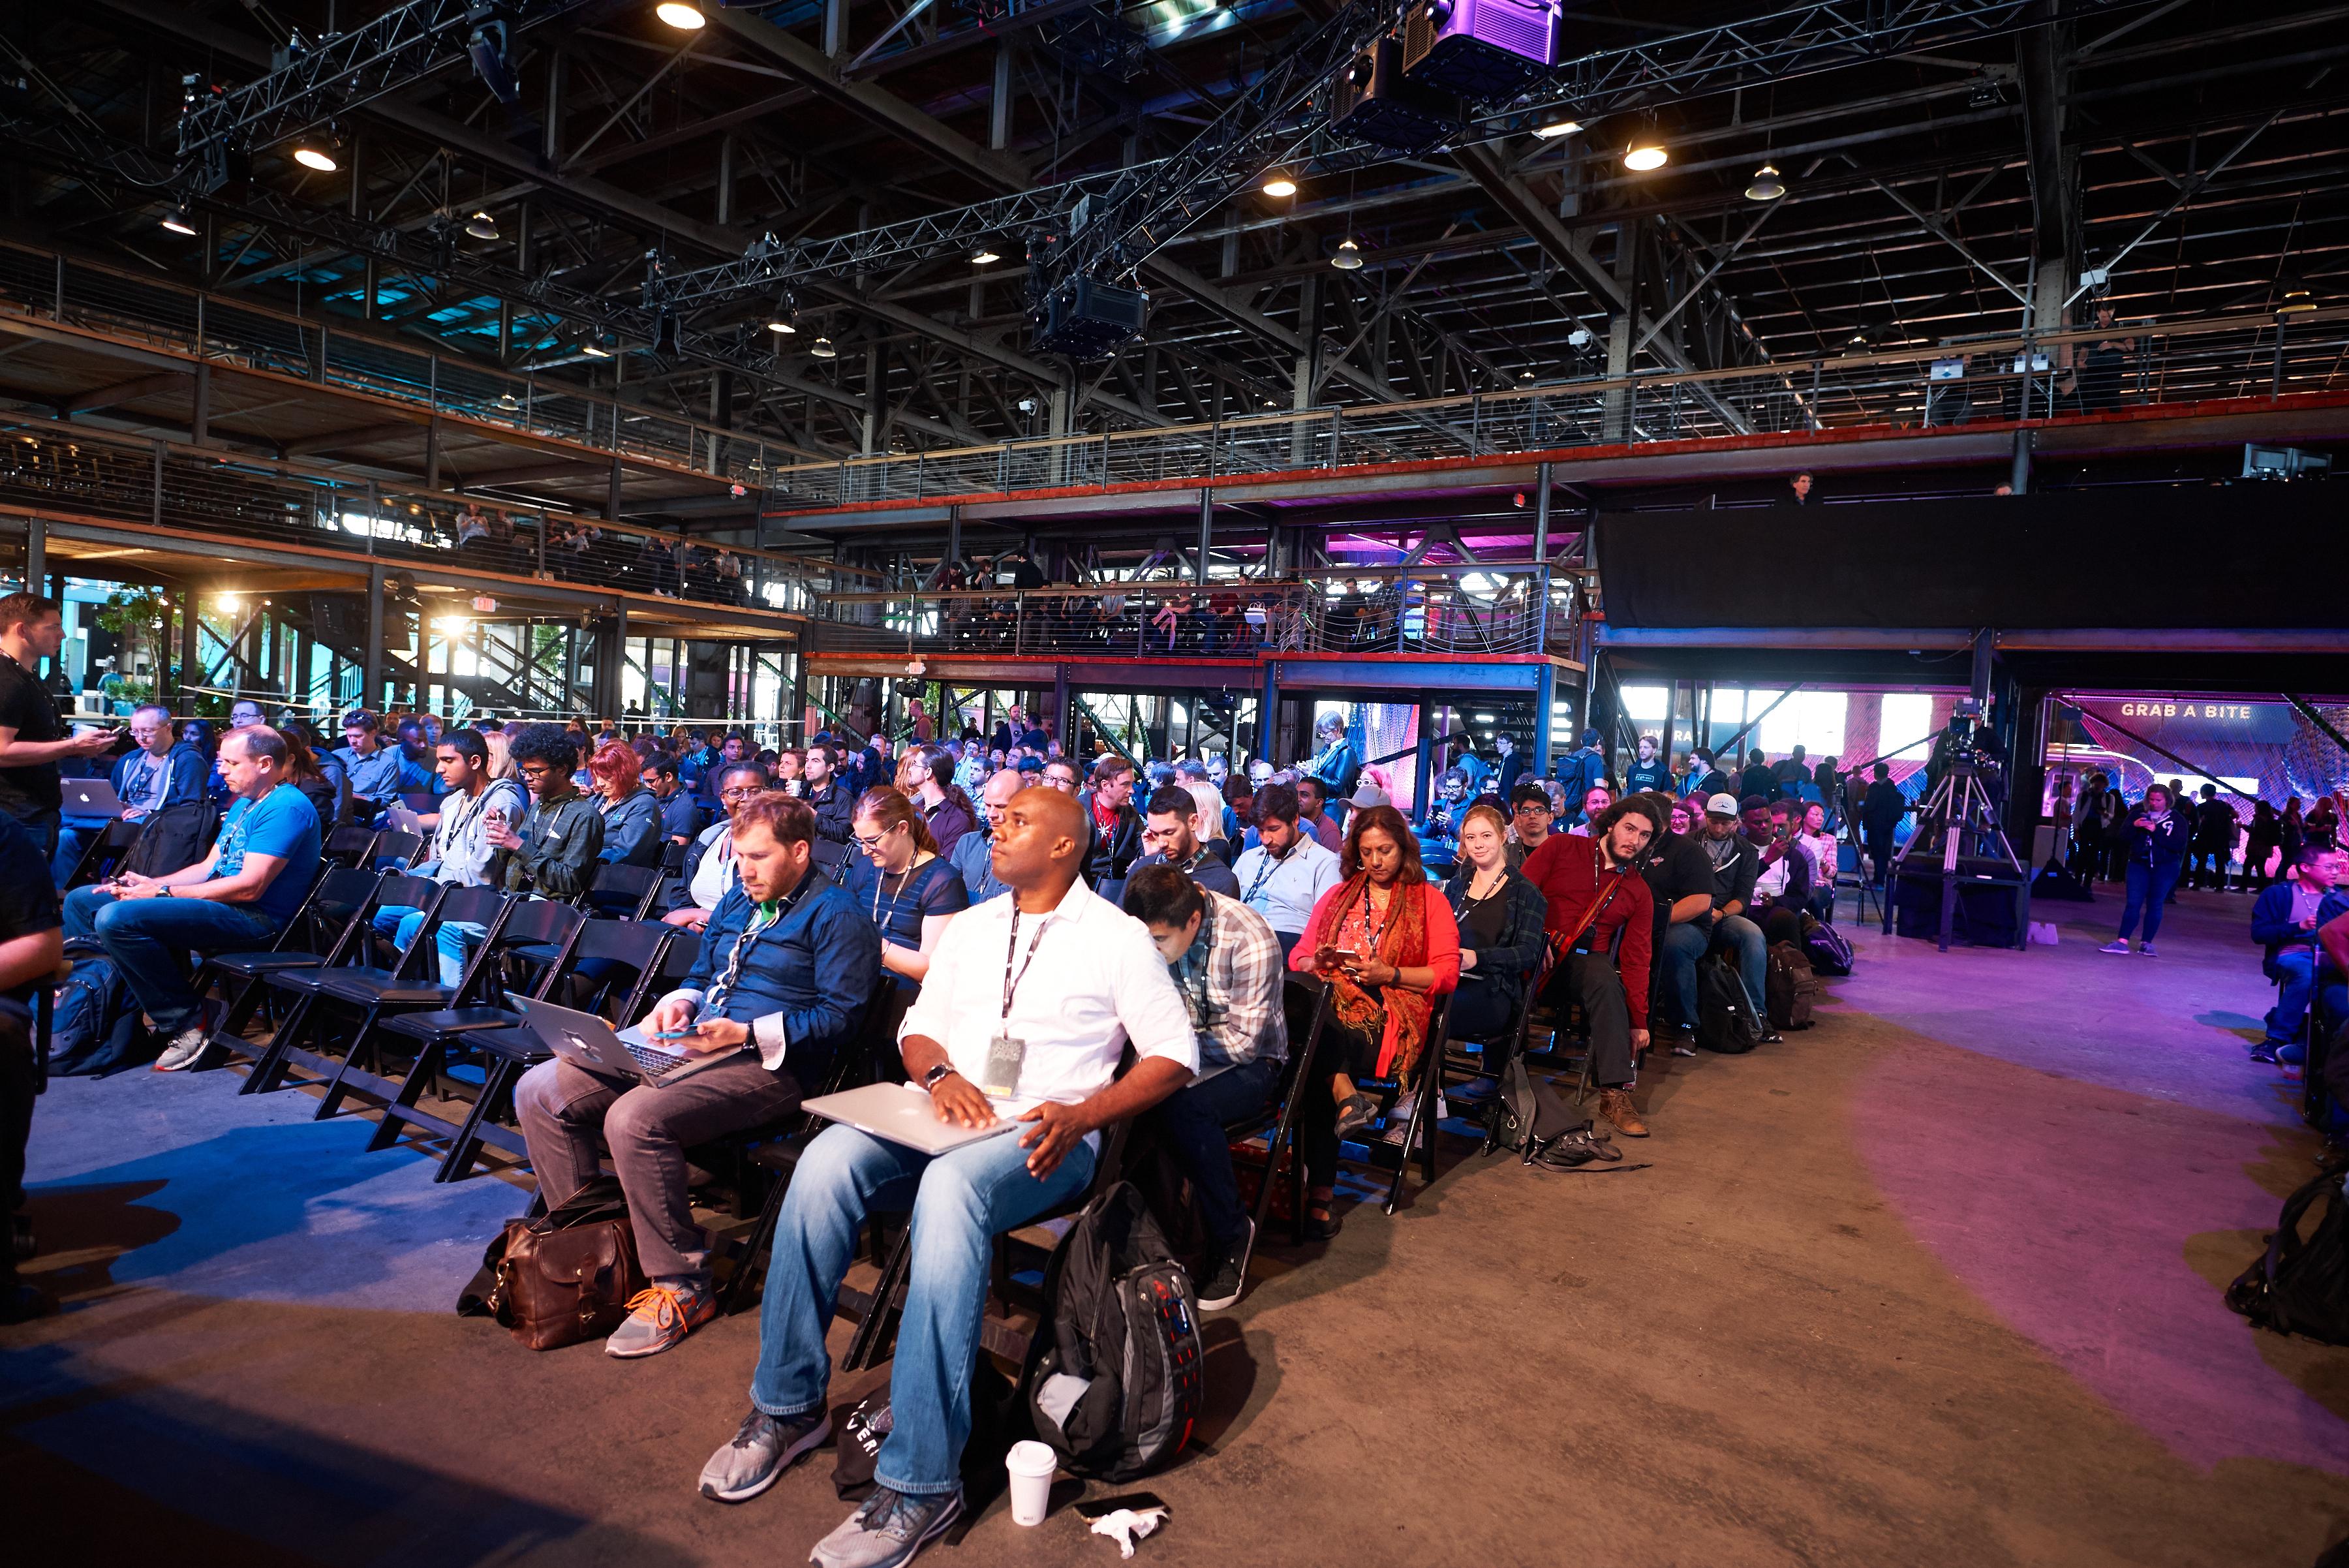 huge crowd at GitHub event